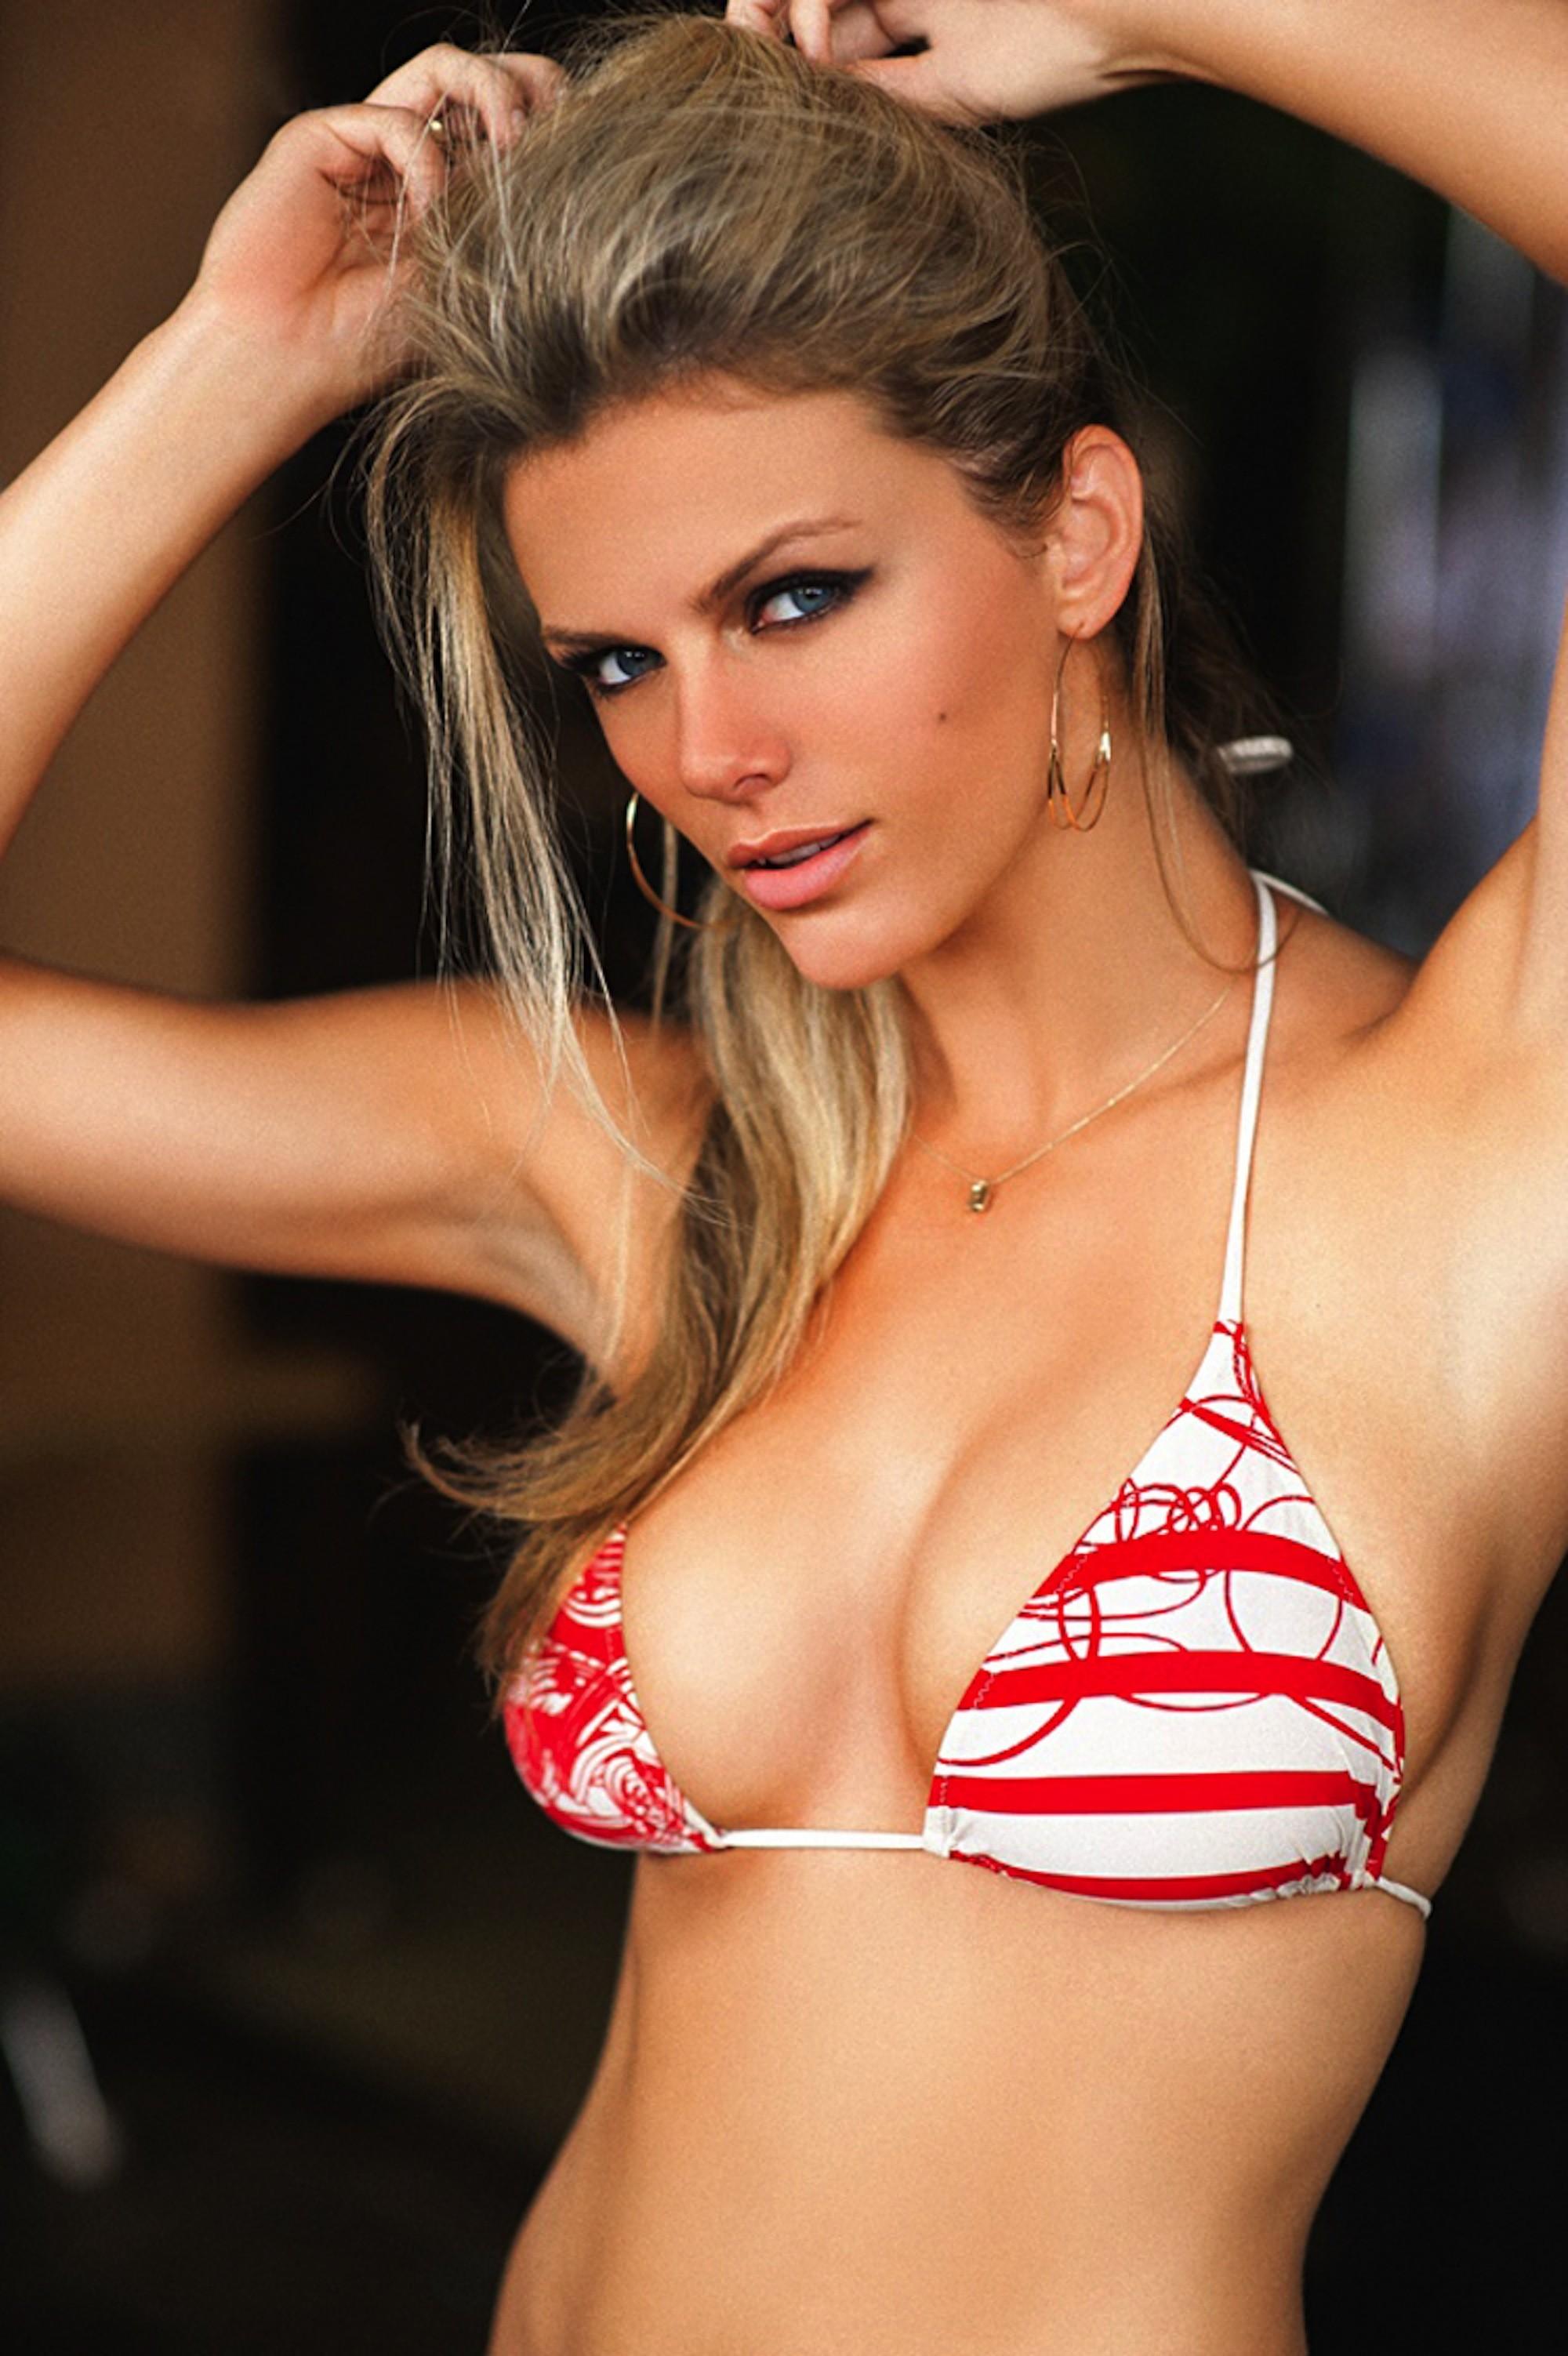 Bikini photo of the day Olivia Culpo Bikini Photo Shoot In 115 Degrees! m